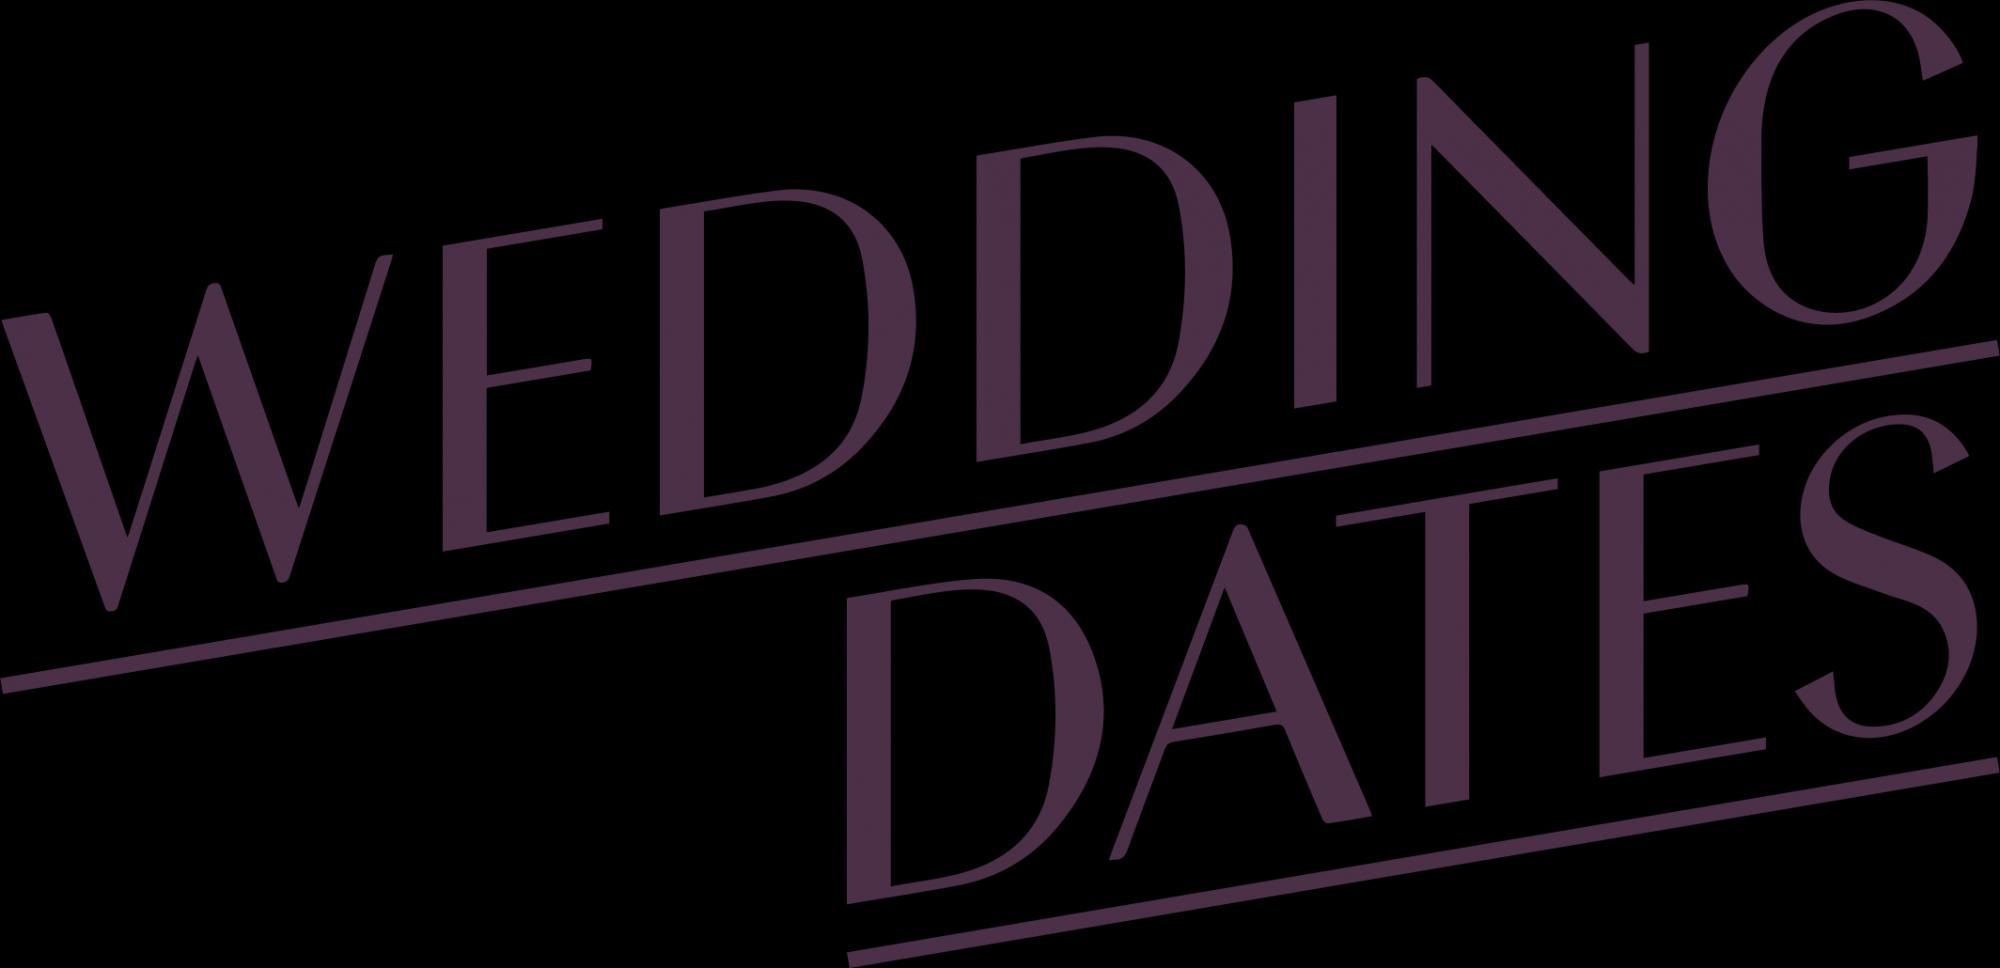 wedding dates logo for blog post